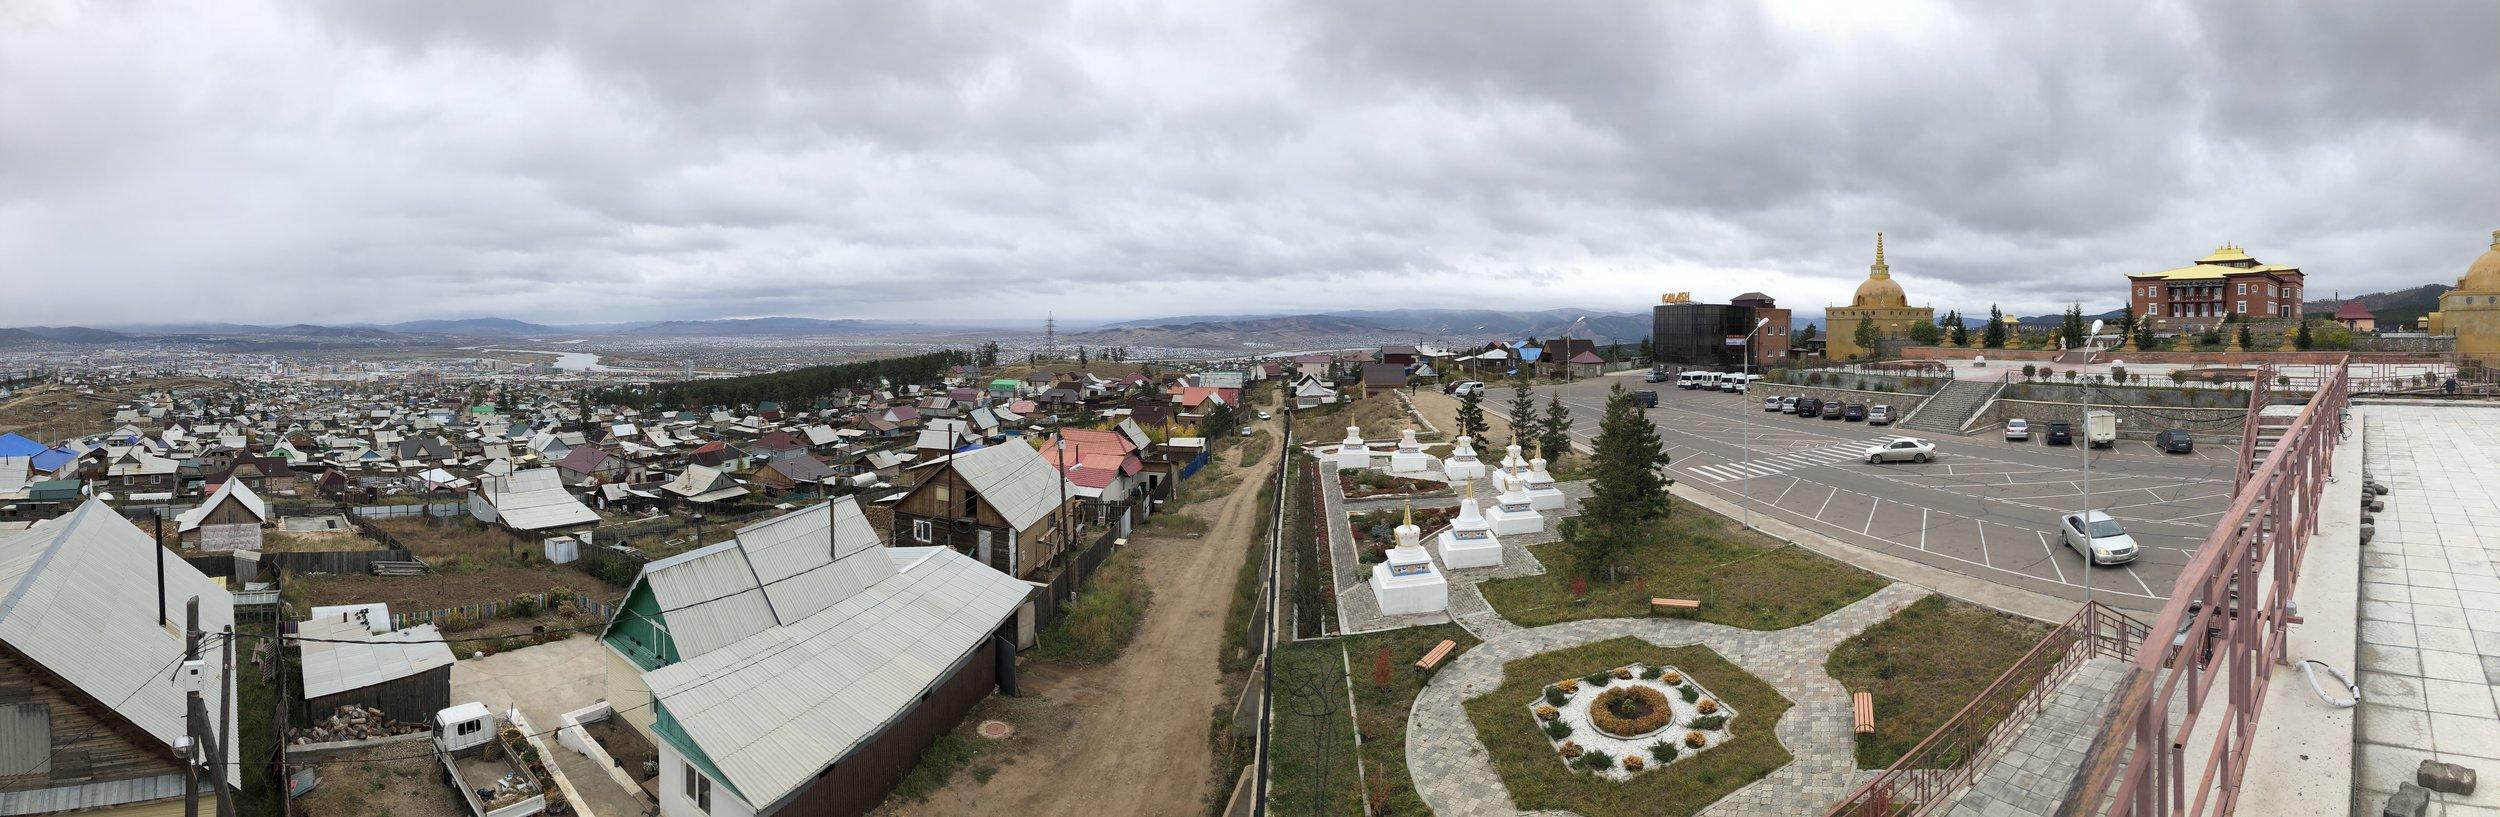 Rinpoche Bagsha temple, Ulan-Ude